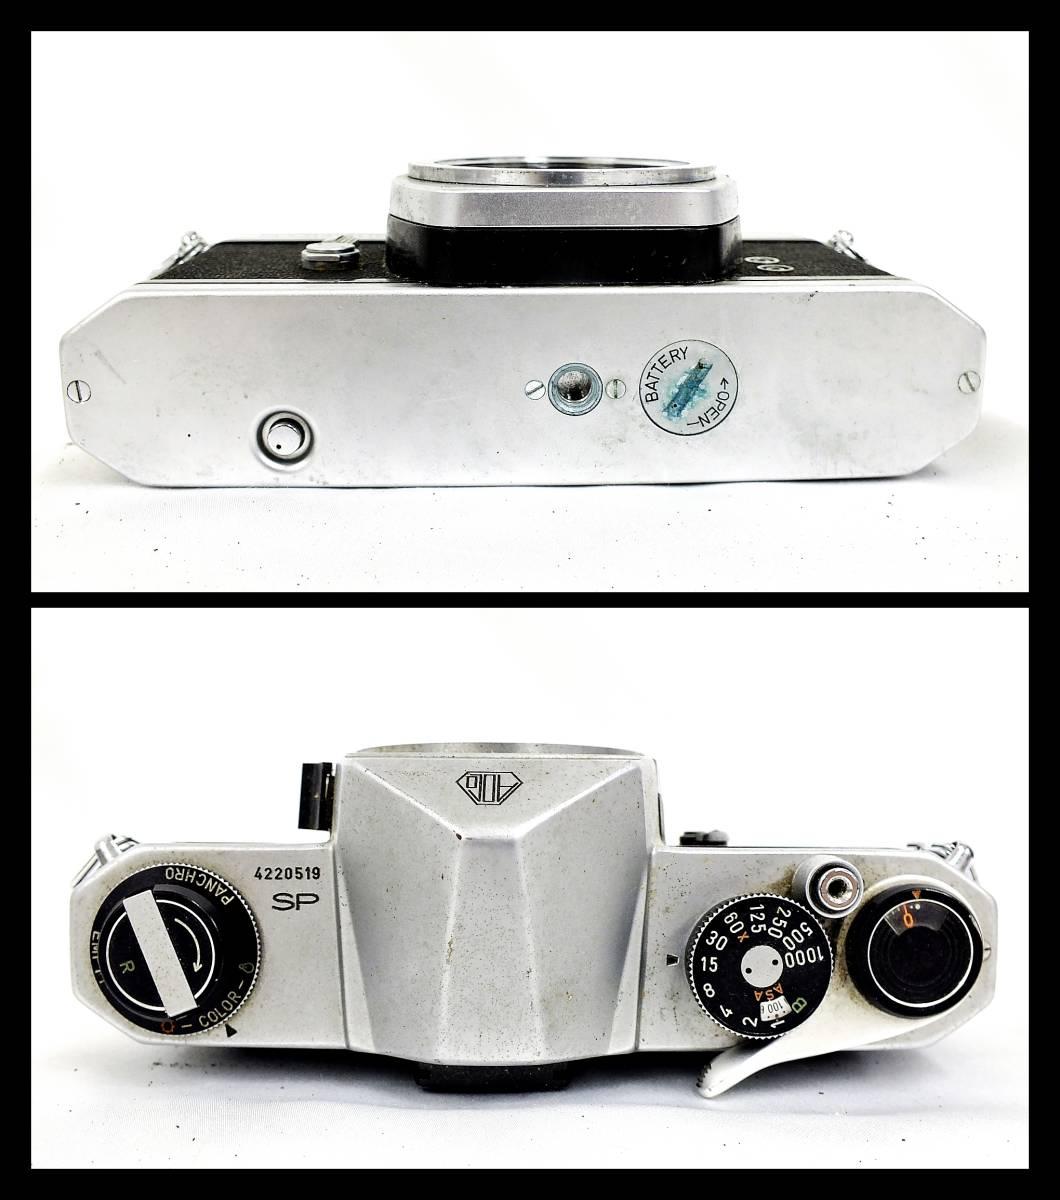 ASAHI PENTAX SPOTMATIC 一眼レフカメラ / Super Multi Coated TAKUMAR F1.4 50mm / F3.5 135mm 等 レンズ付き ジャンク 大ReB21 1208 5_画像3